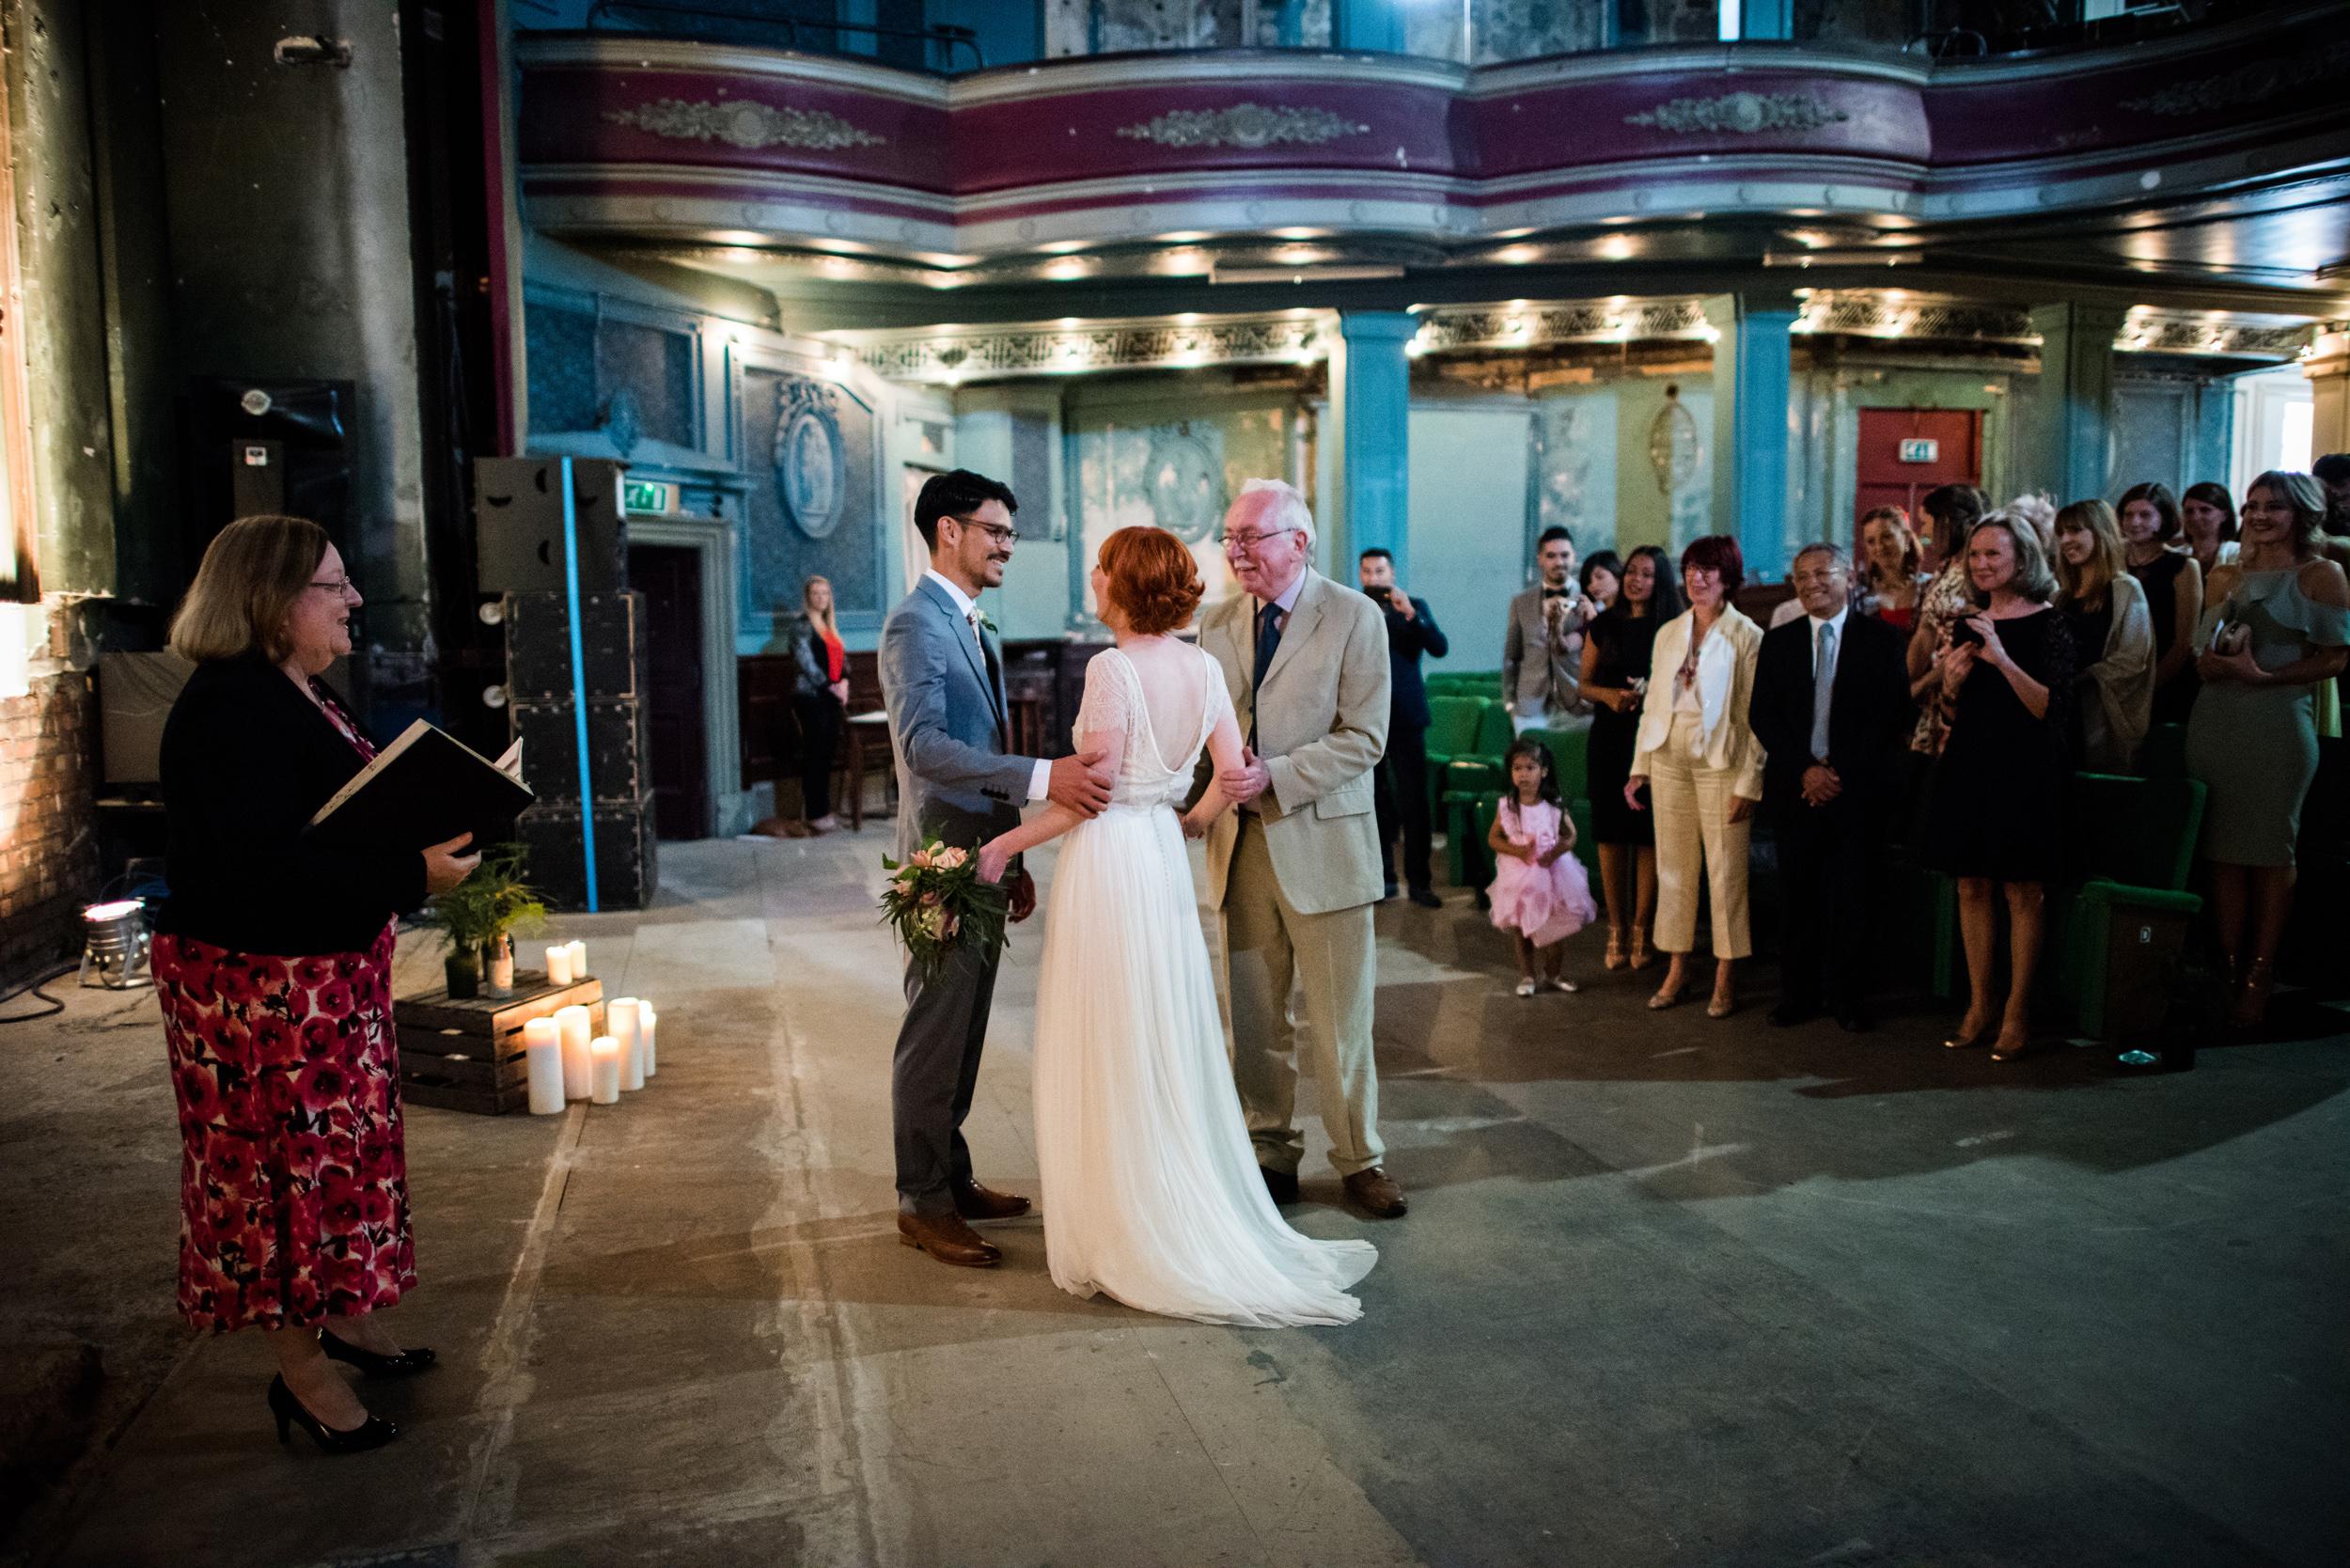 Jill-kate-Beaumont-Lace-Sheffield-Wedding-3.jpg